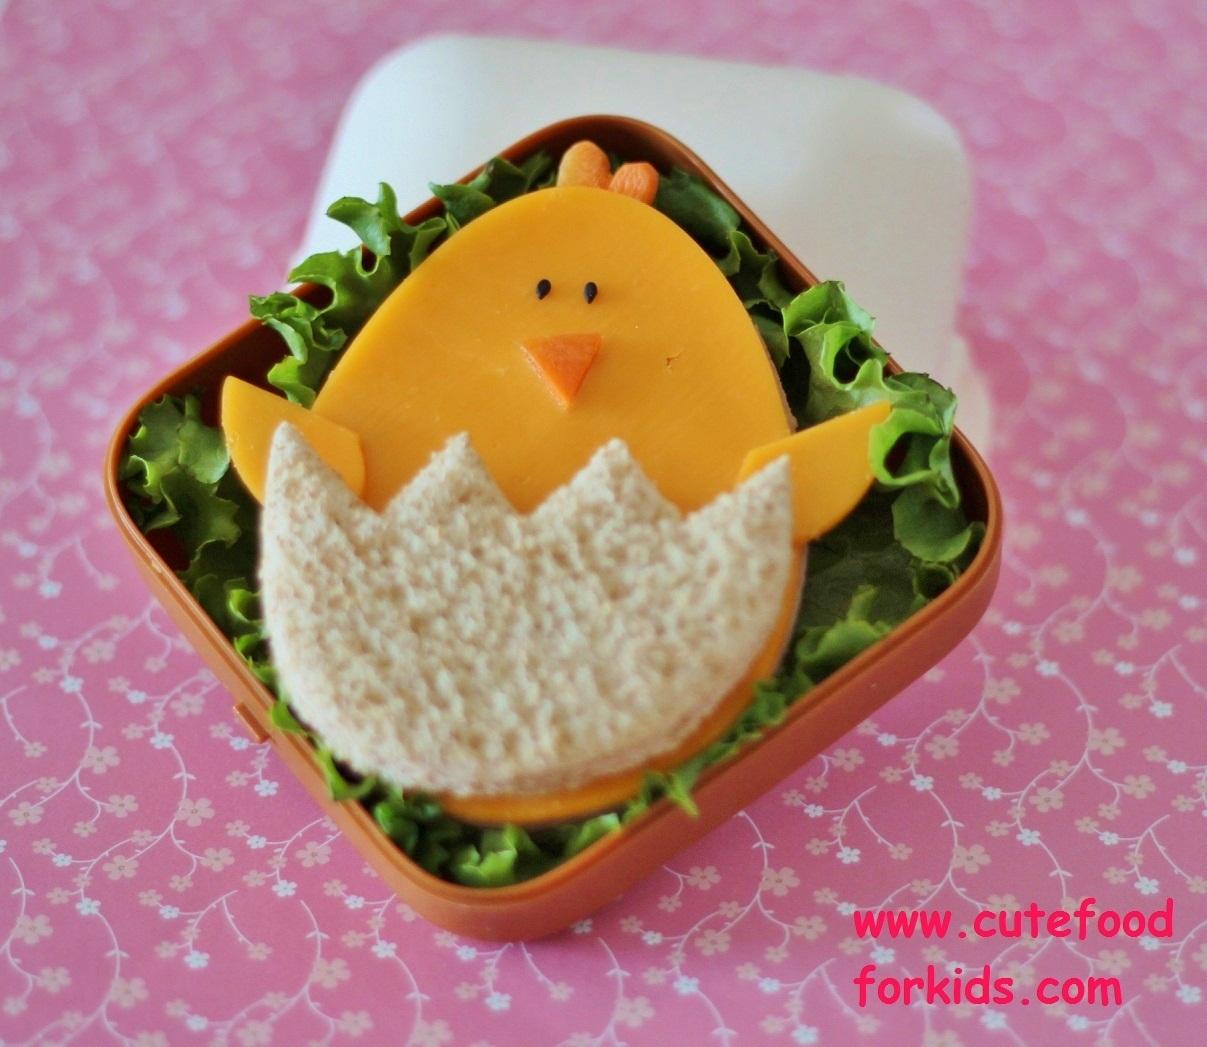 Gallery For gt Cute Foods Kids